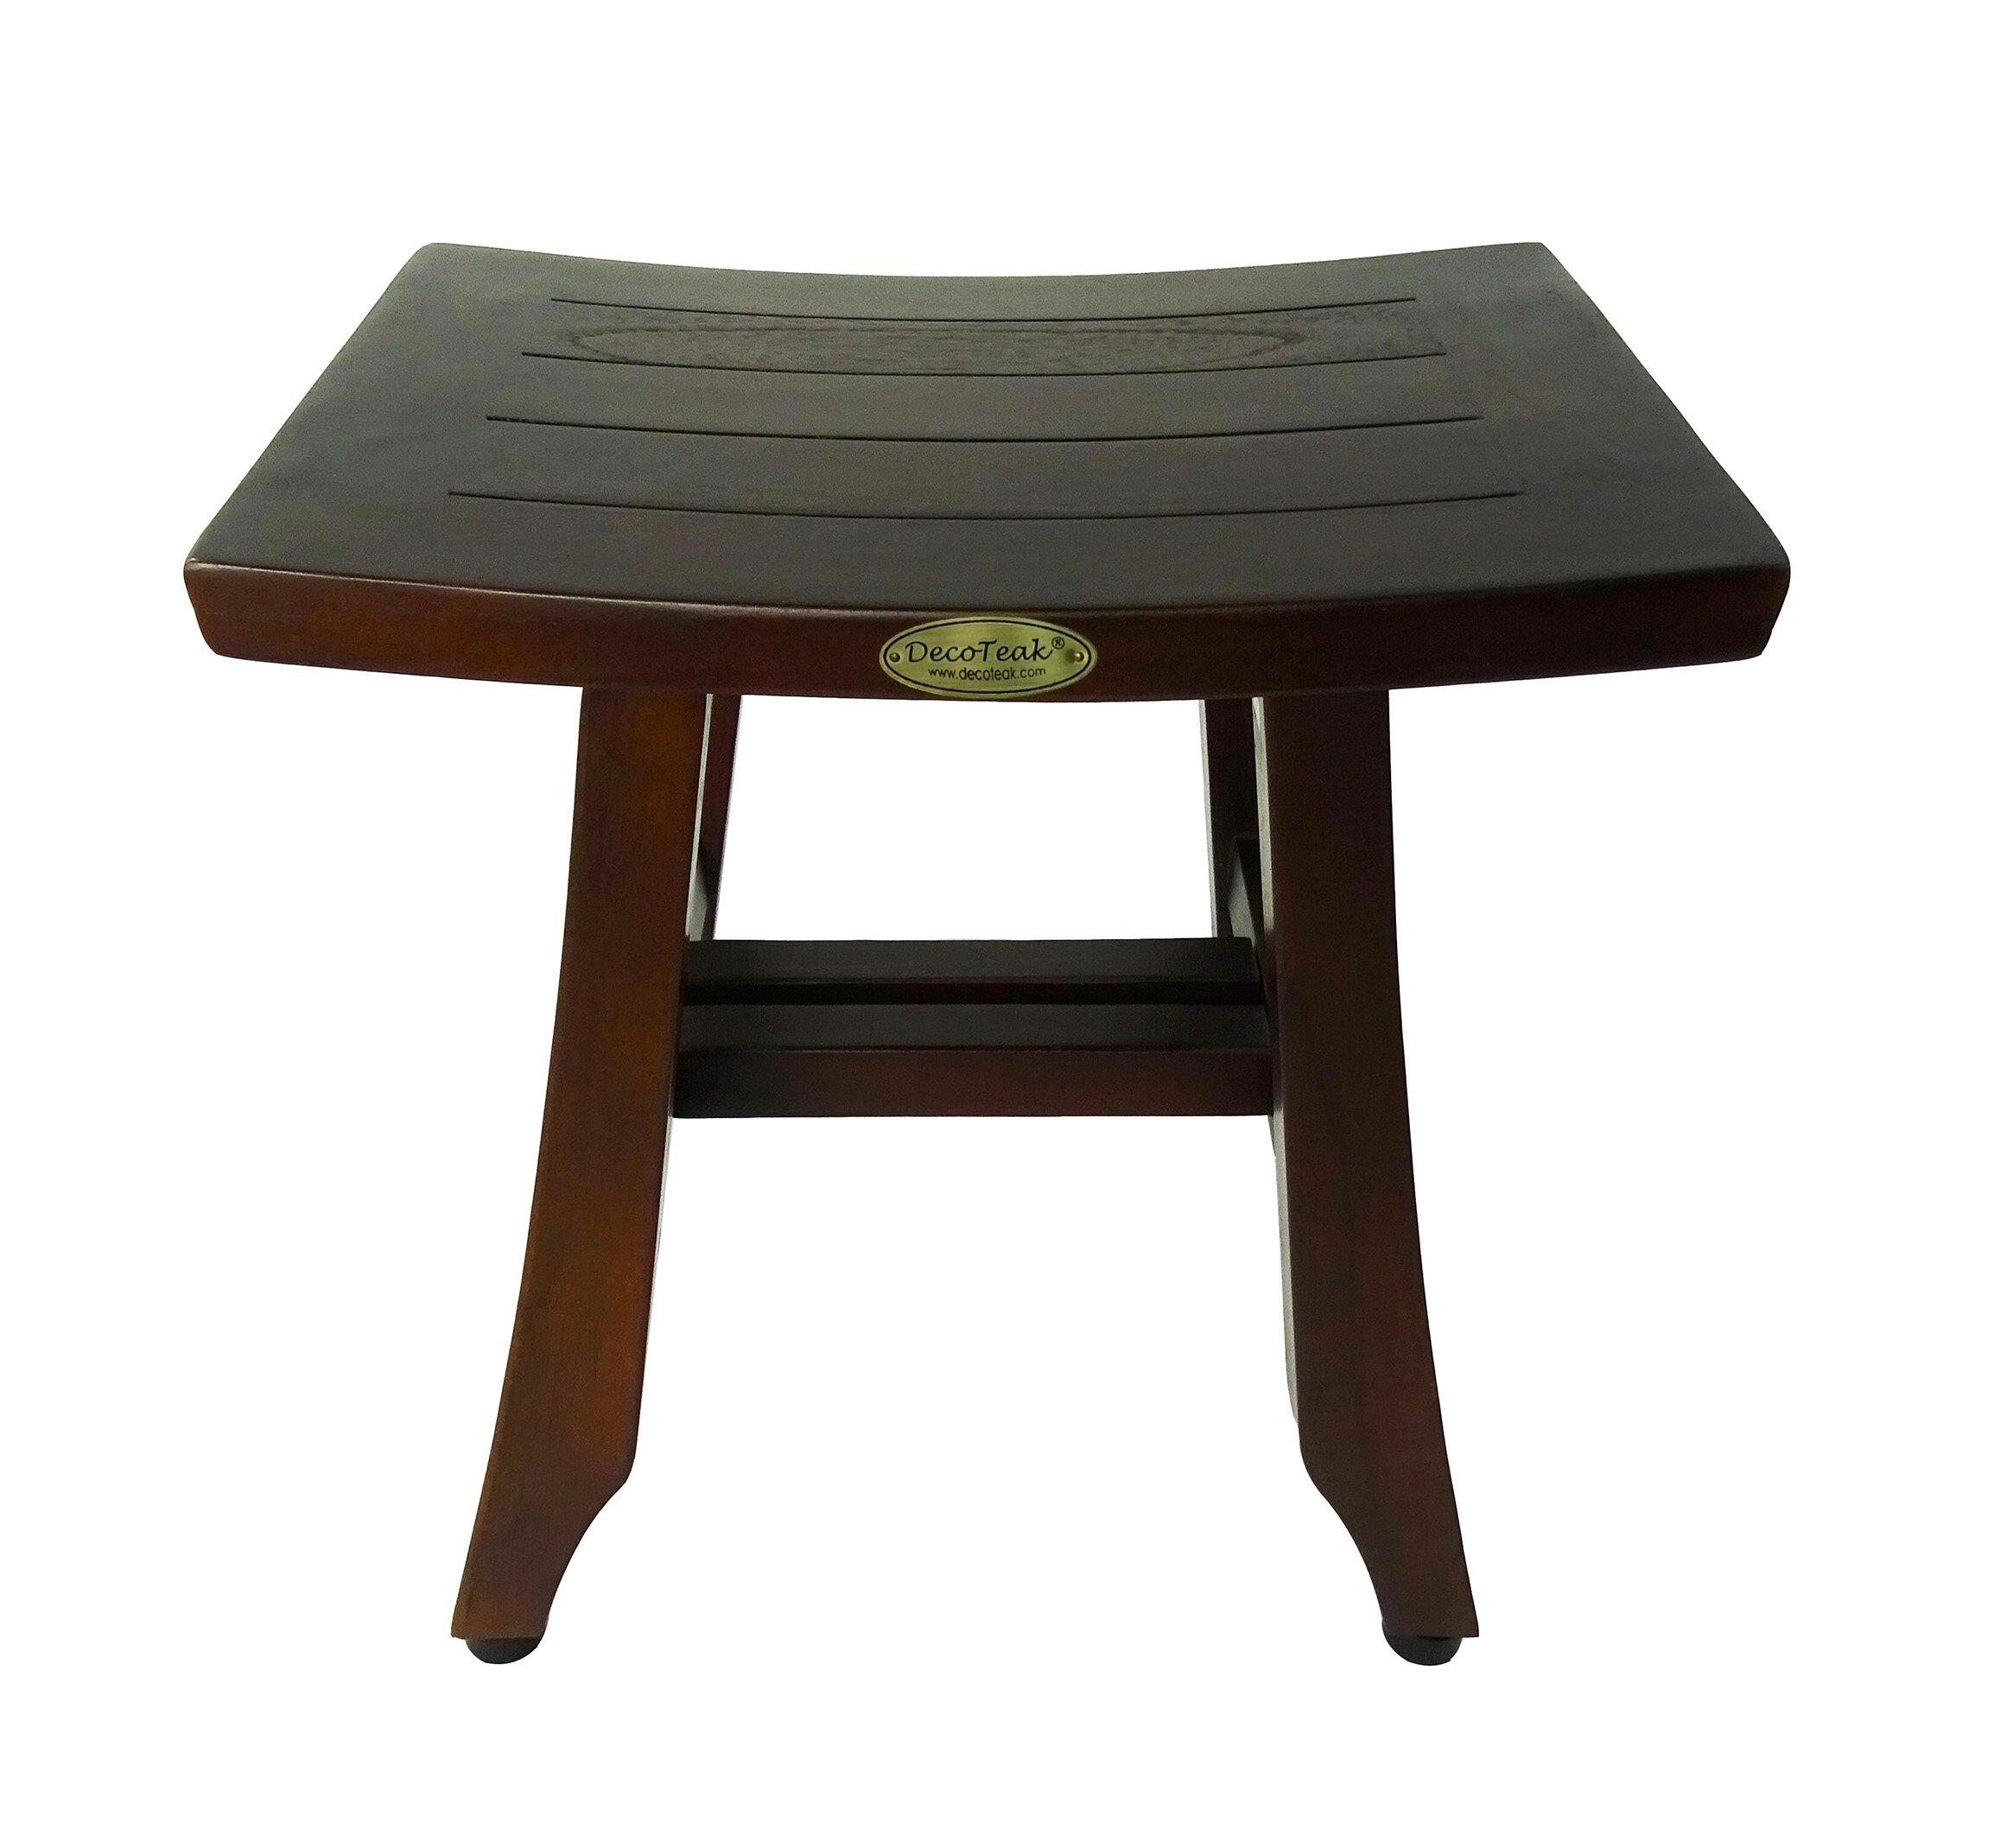 small bathroom folding for vanity corner shower best stool of dhara teak ideas